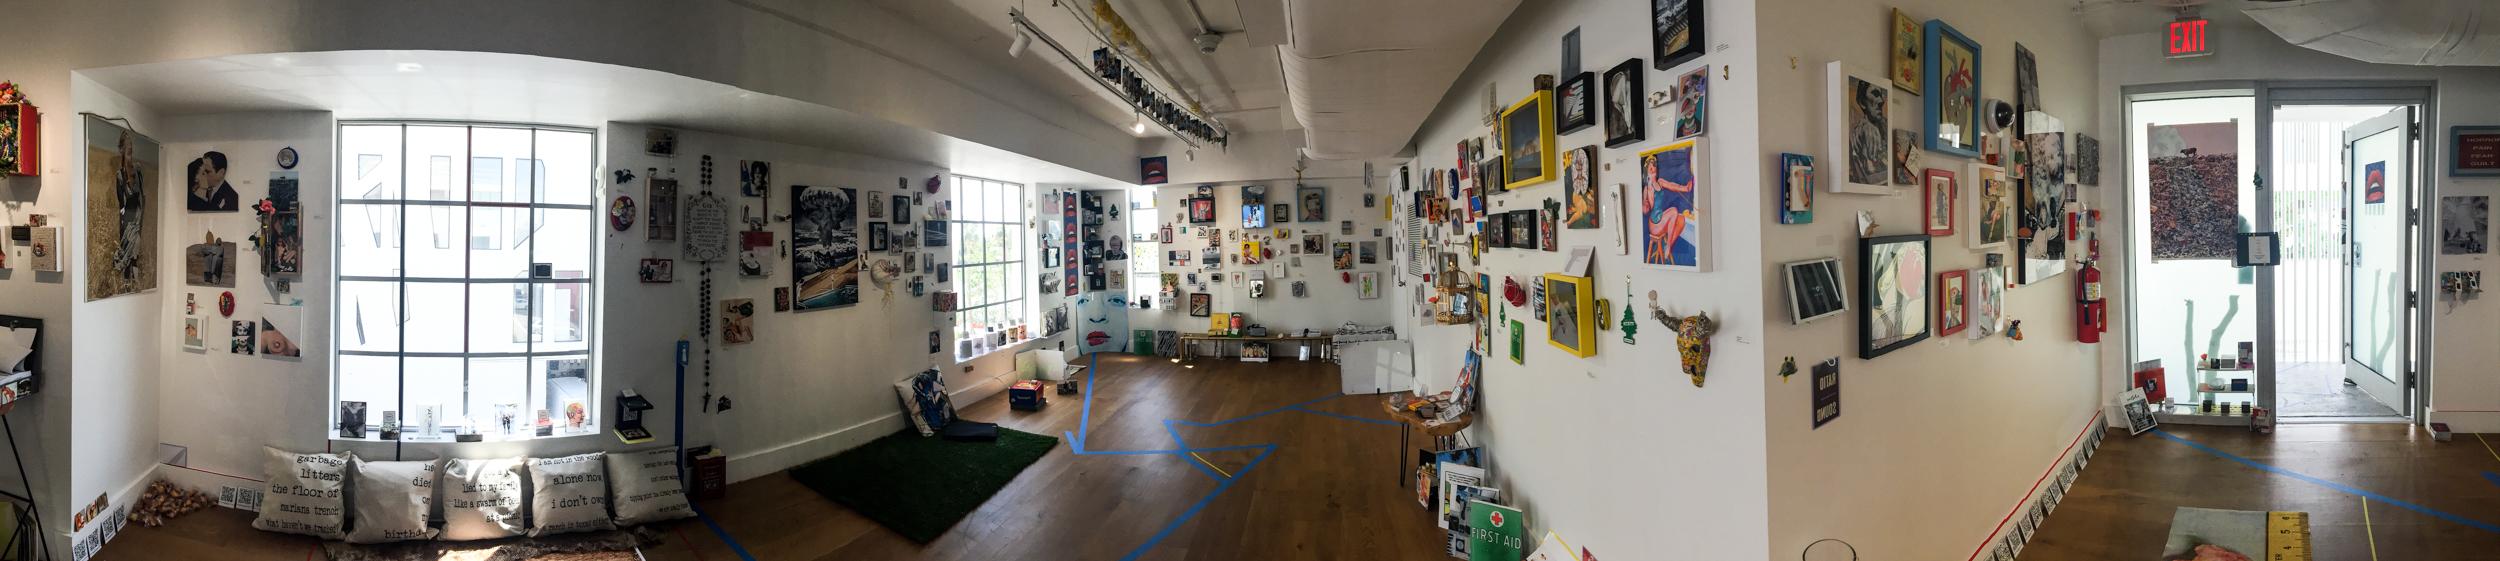 Faena-Exhibition-Images-133.jpg